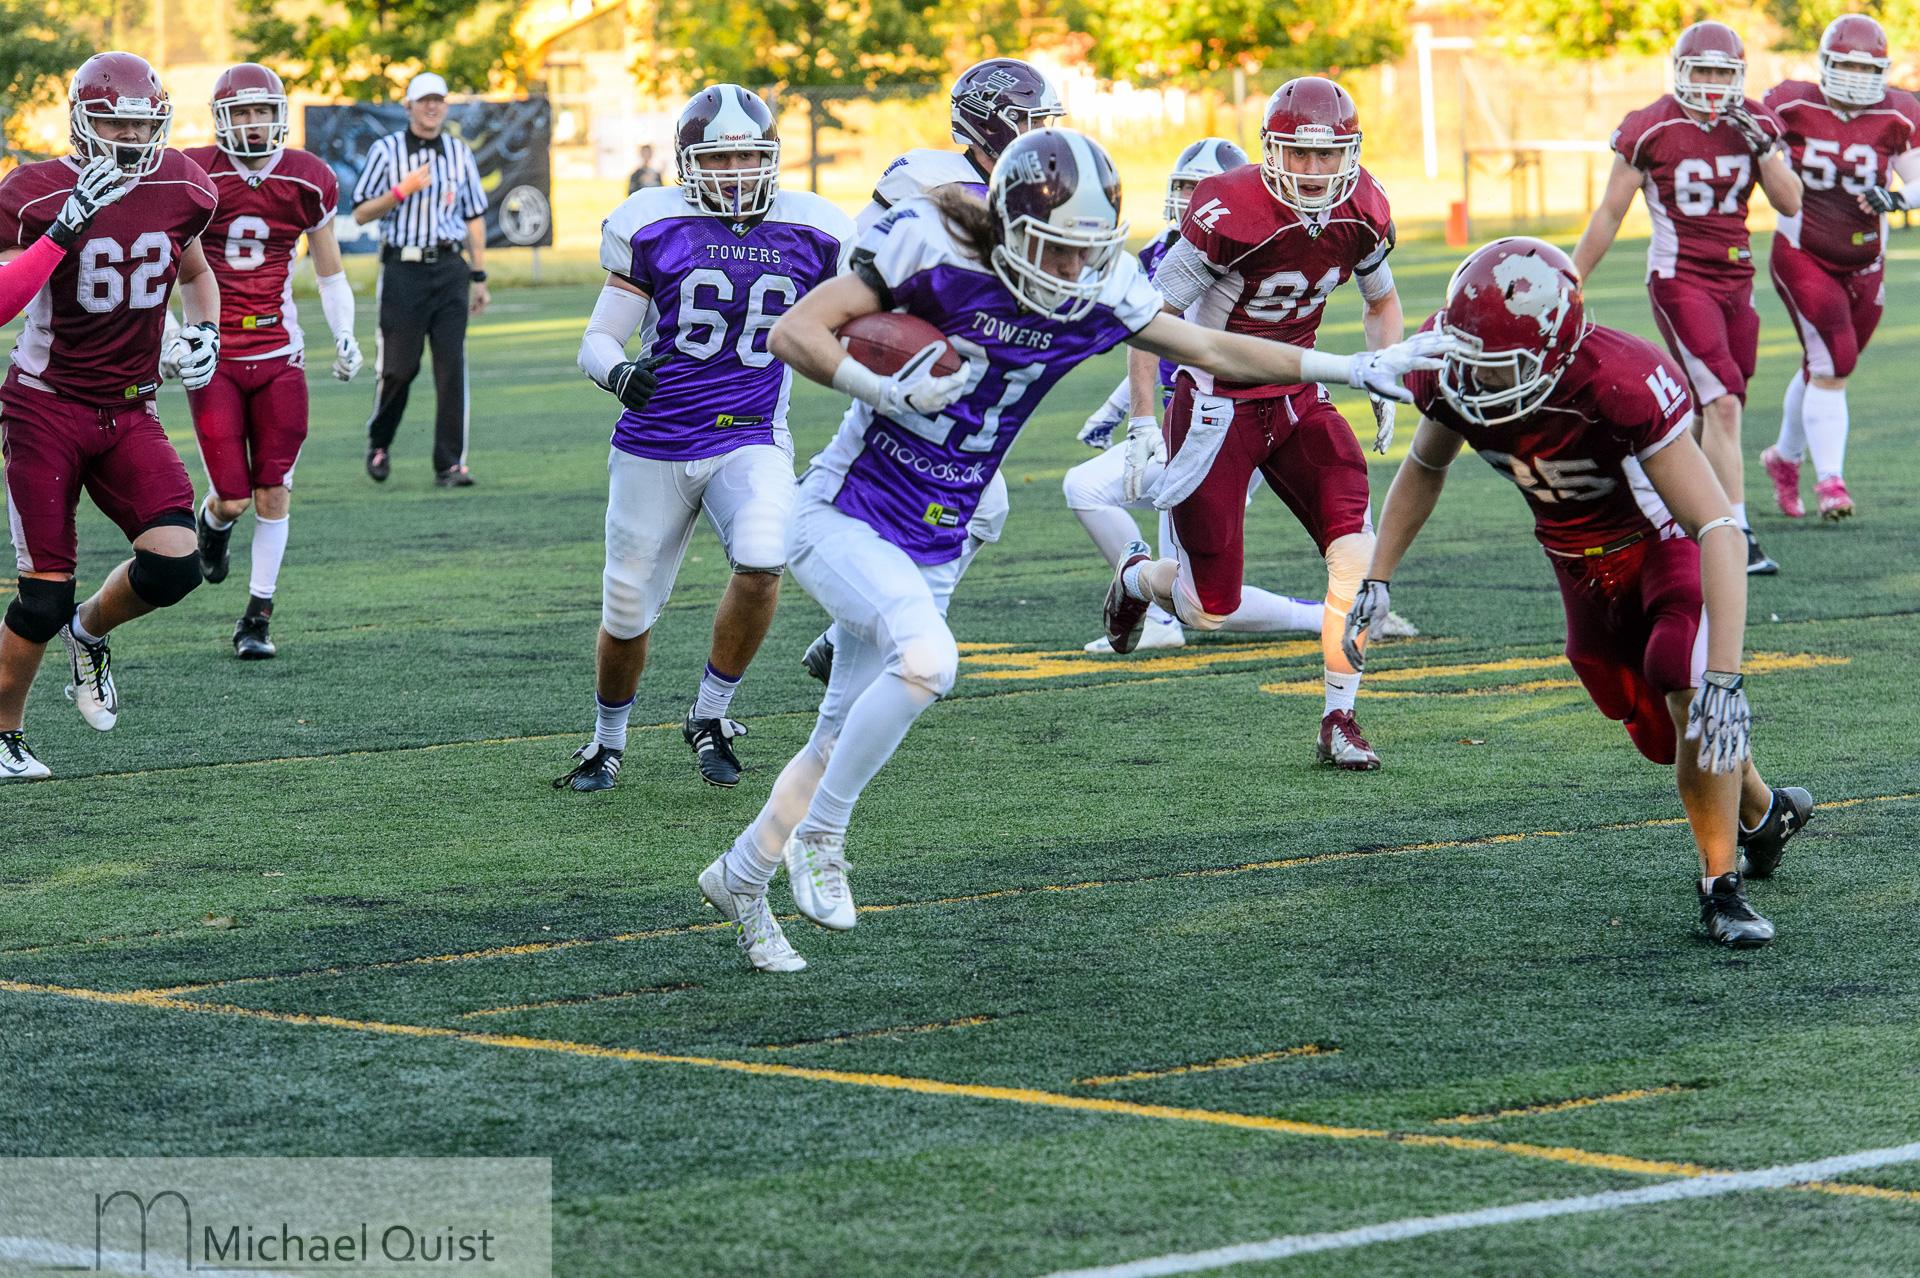 Junior-Bowl-2015-Copenhagen-Towers-vs-Herlev-Rebels-56